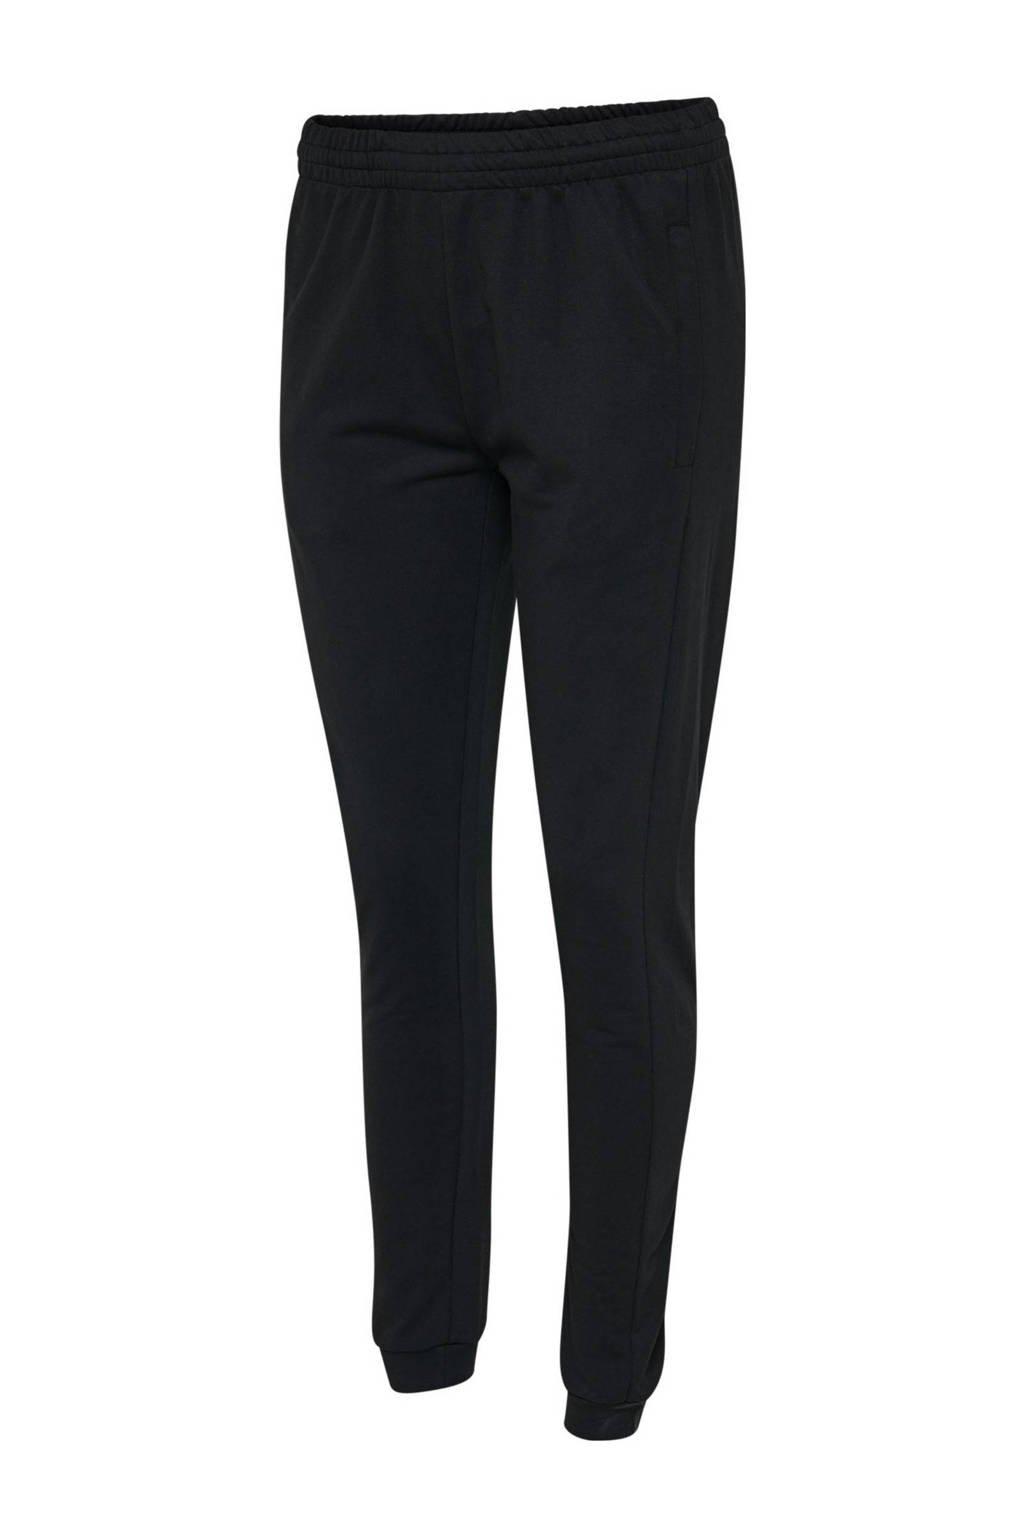 hummel joggingbroek zwart, Zwart